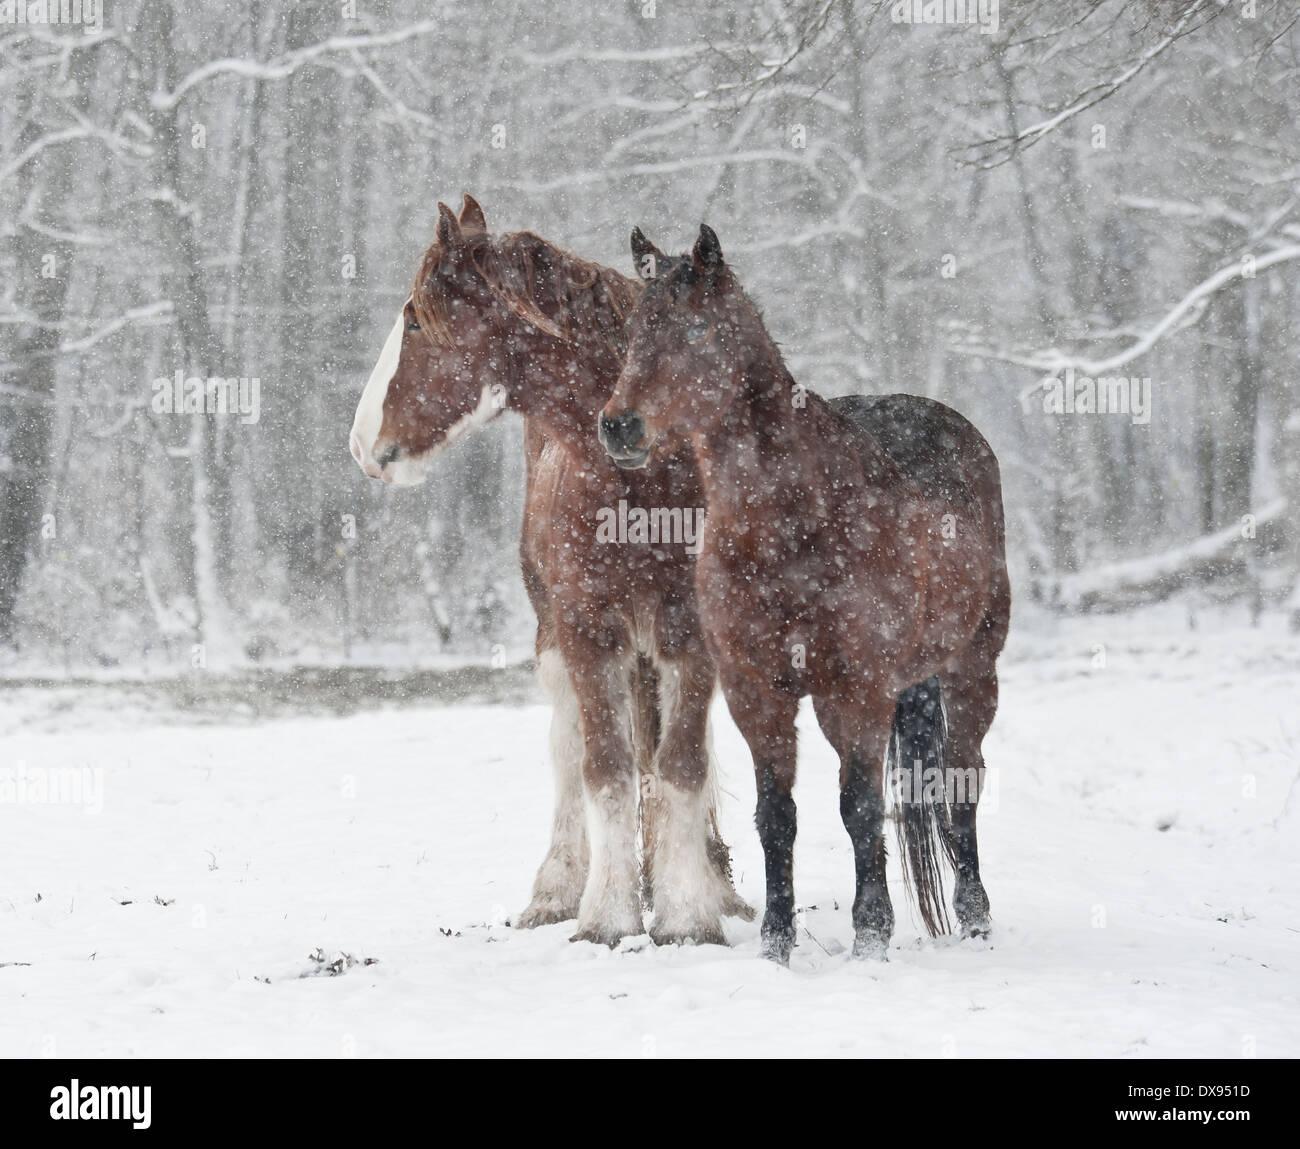 Draft and Morgan horses in snowstorm - Stock Image